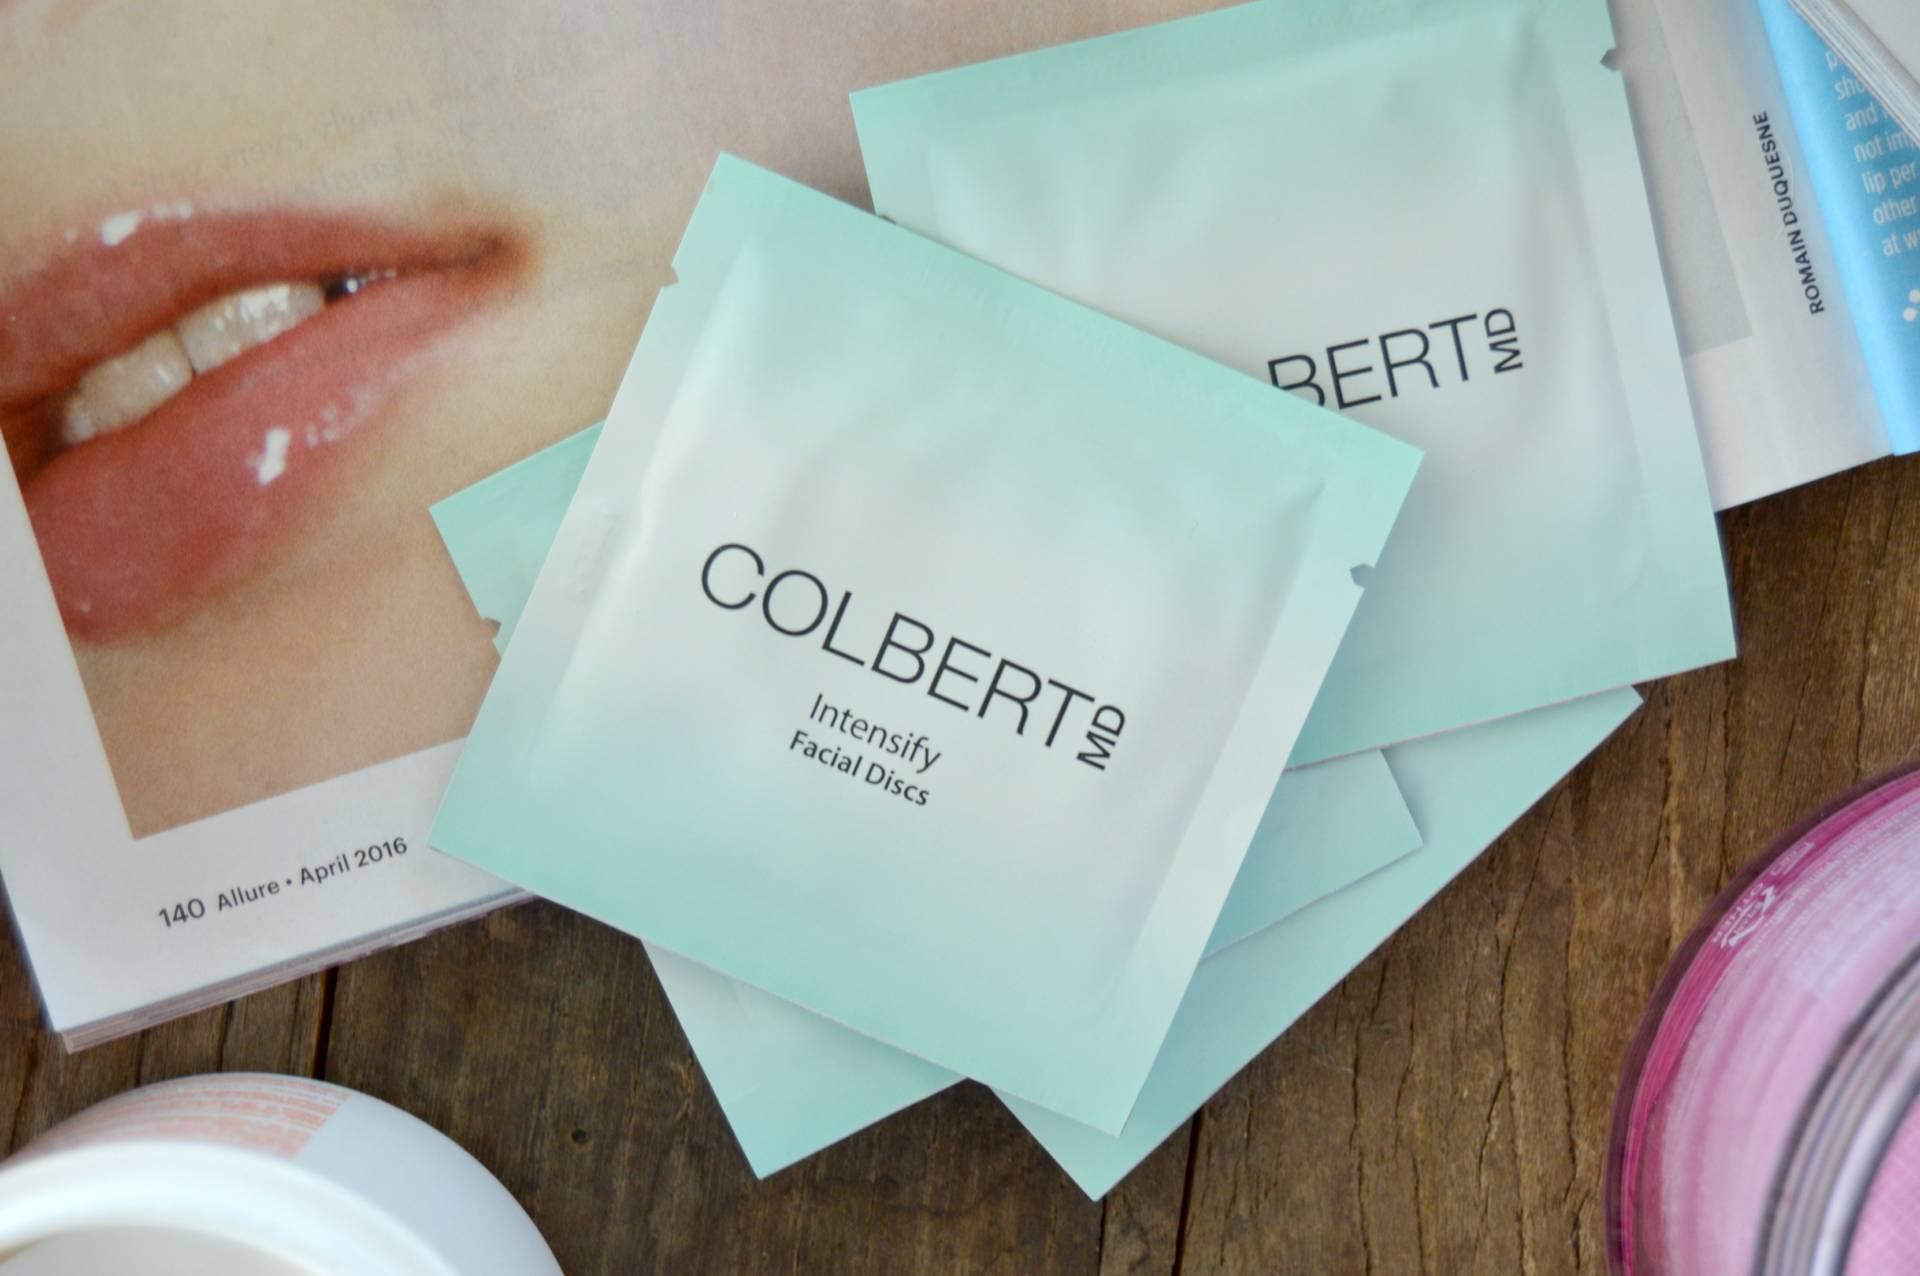 colbert md intensify facial discs review inhautepurusit